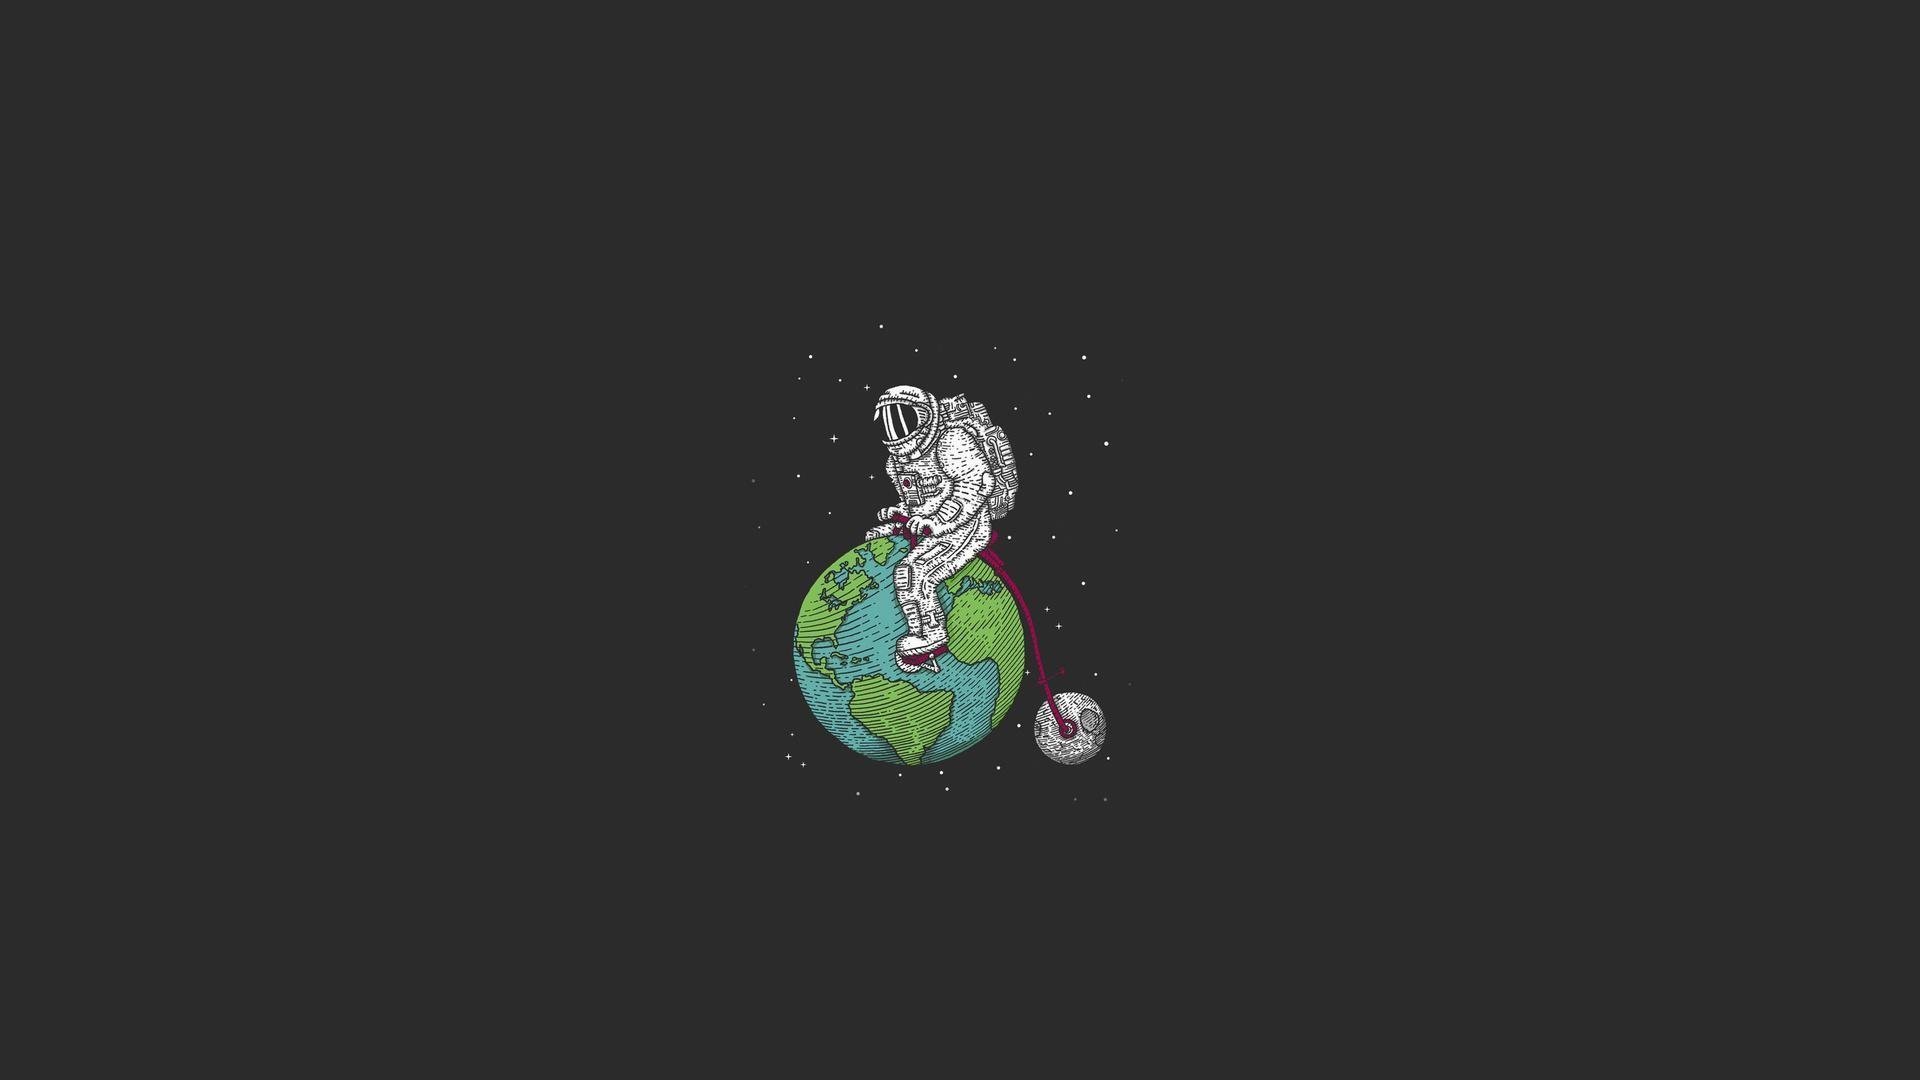 wallpaper.wiki-Free-Download-Astronaut-Image-PIC-WPD0013903